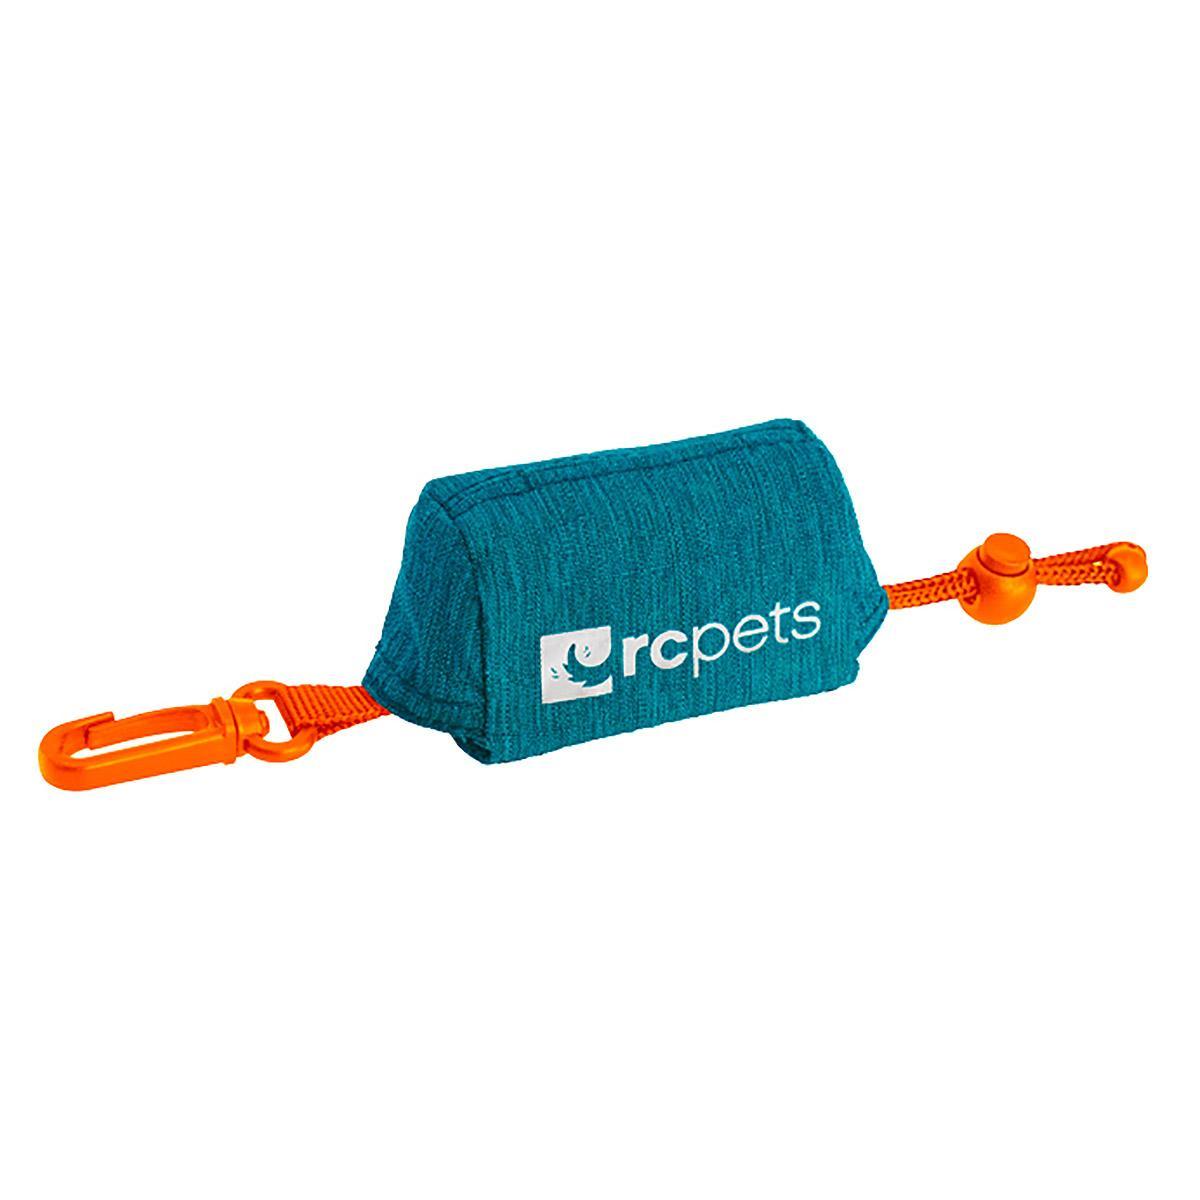 P.U.P Bag Dog Waste Bag Holder Leash Accessory - Heather Teal